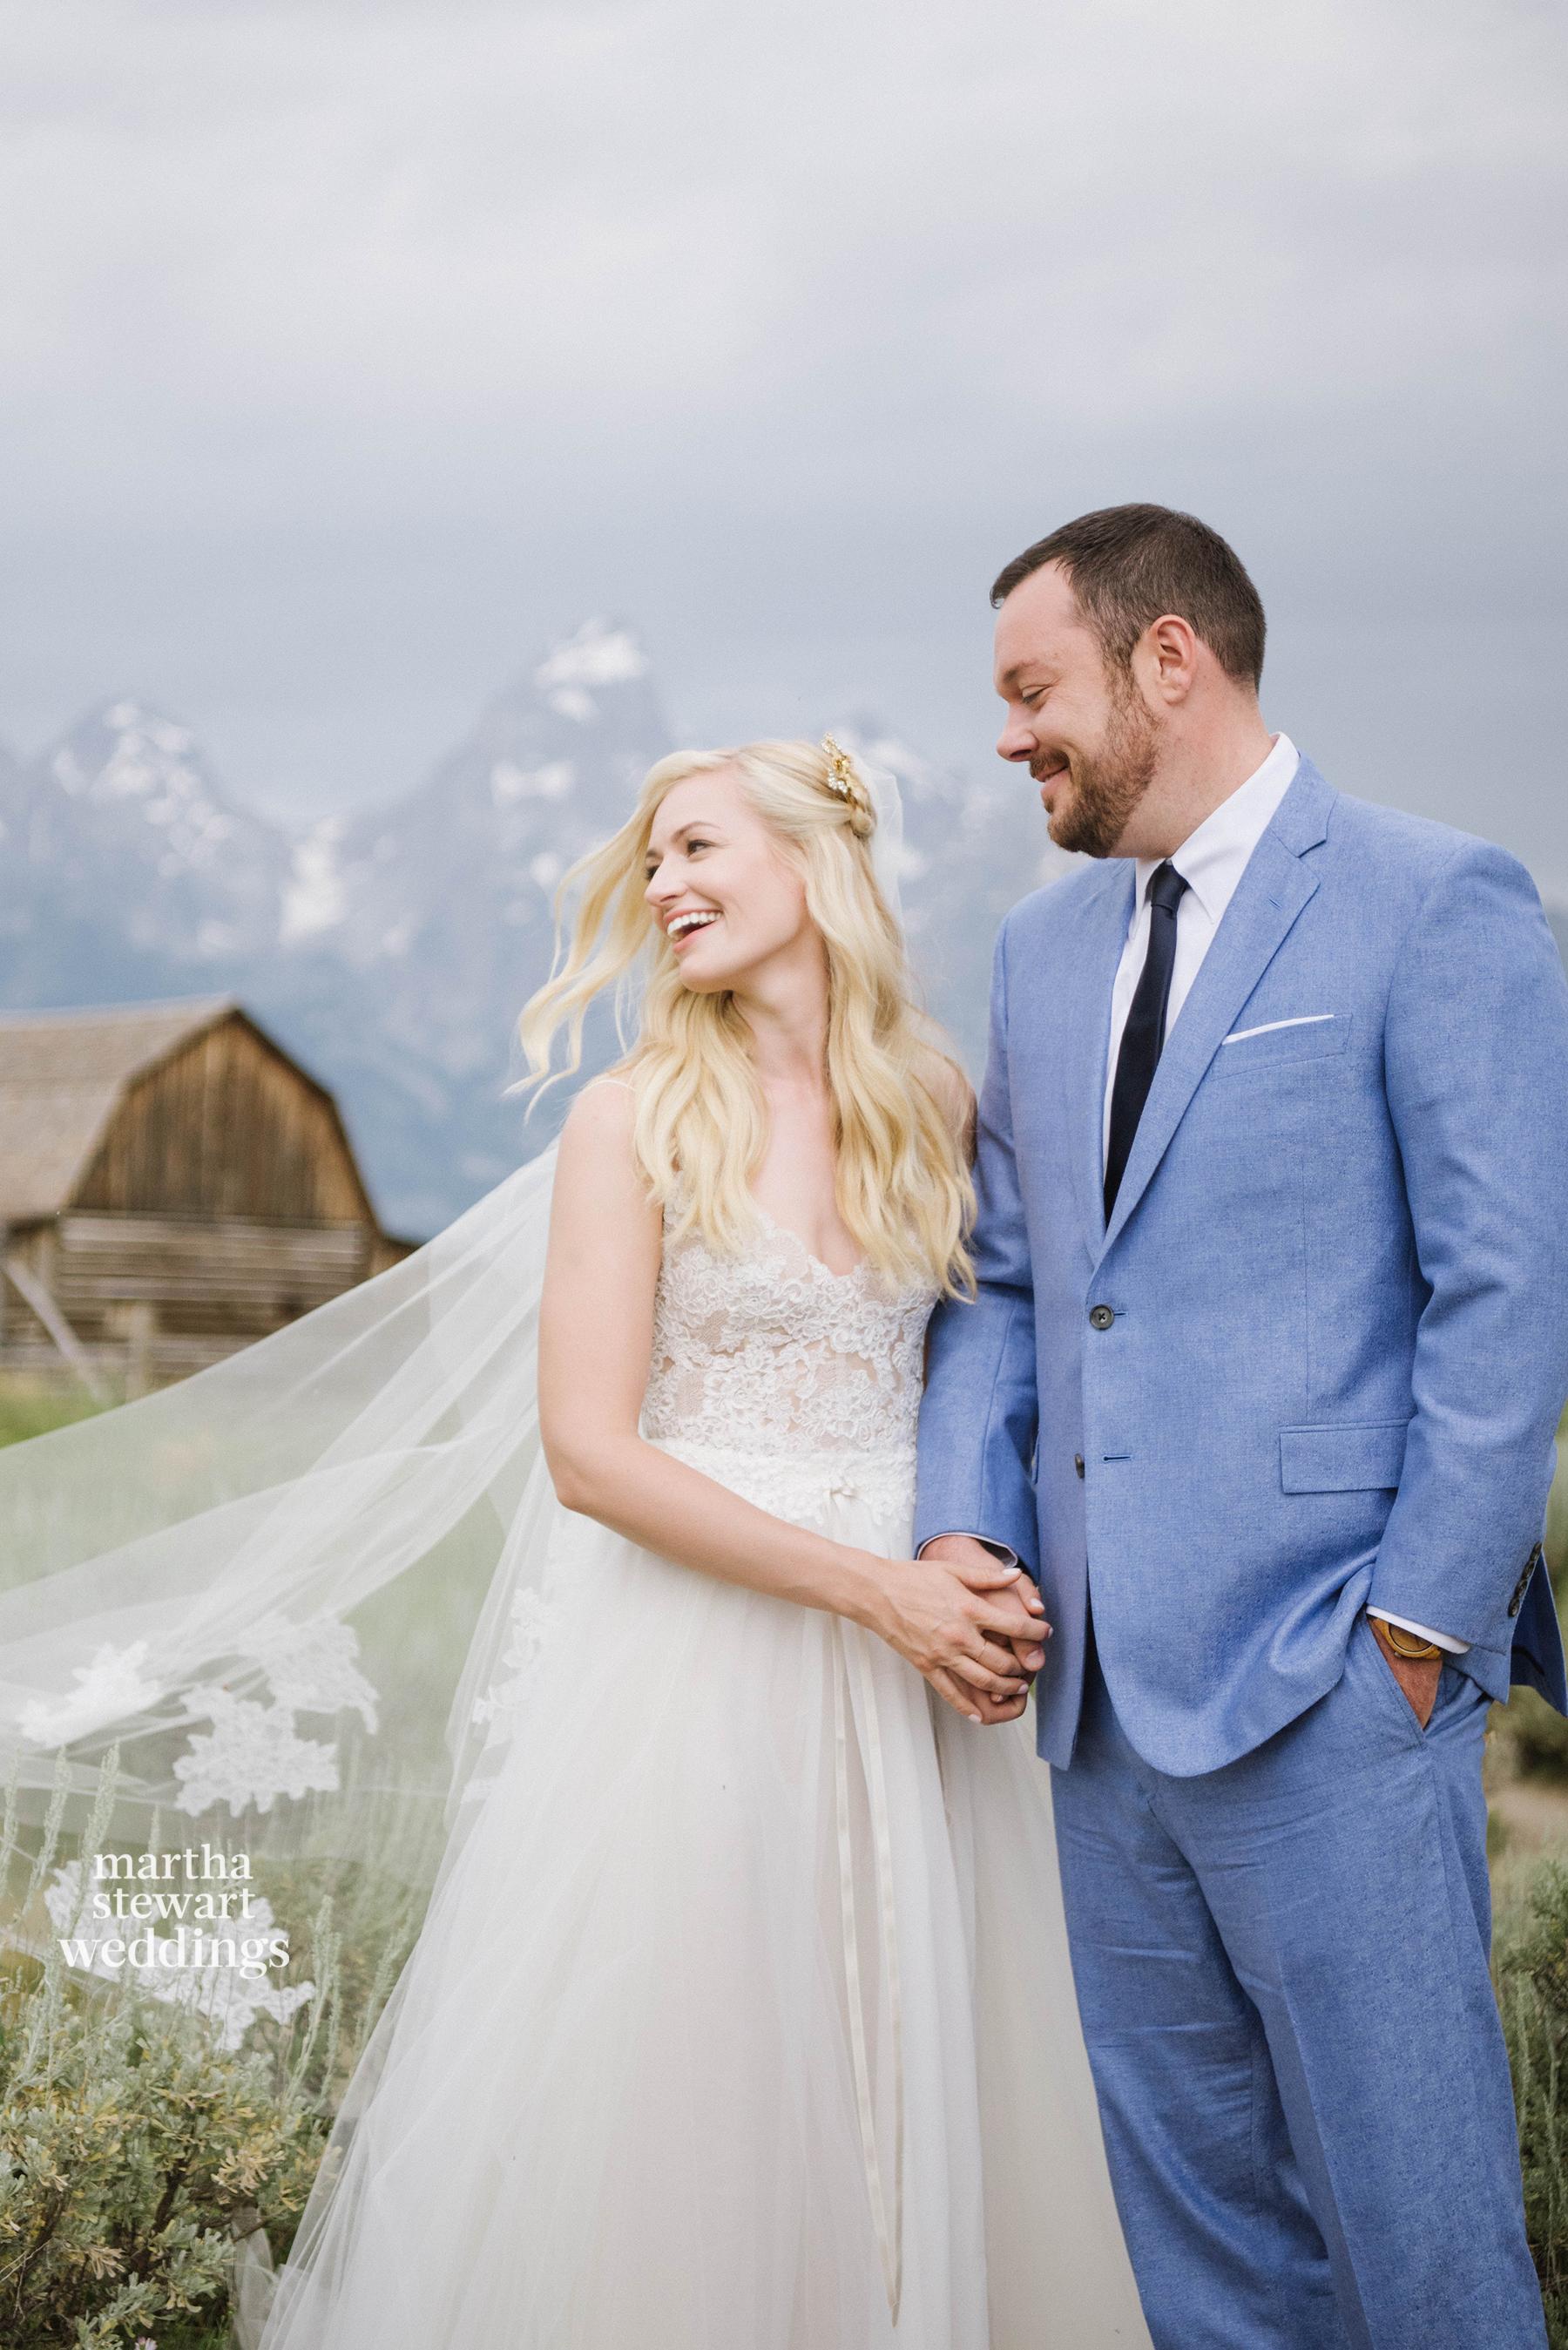 beth behrs and michael gladis wedding portrait